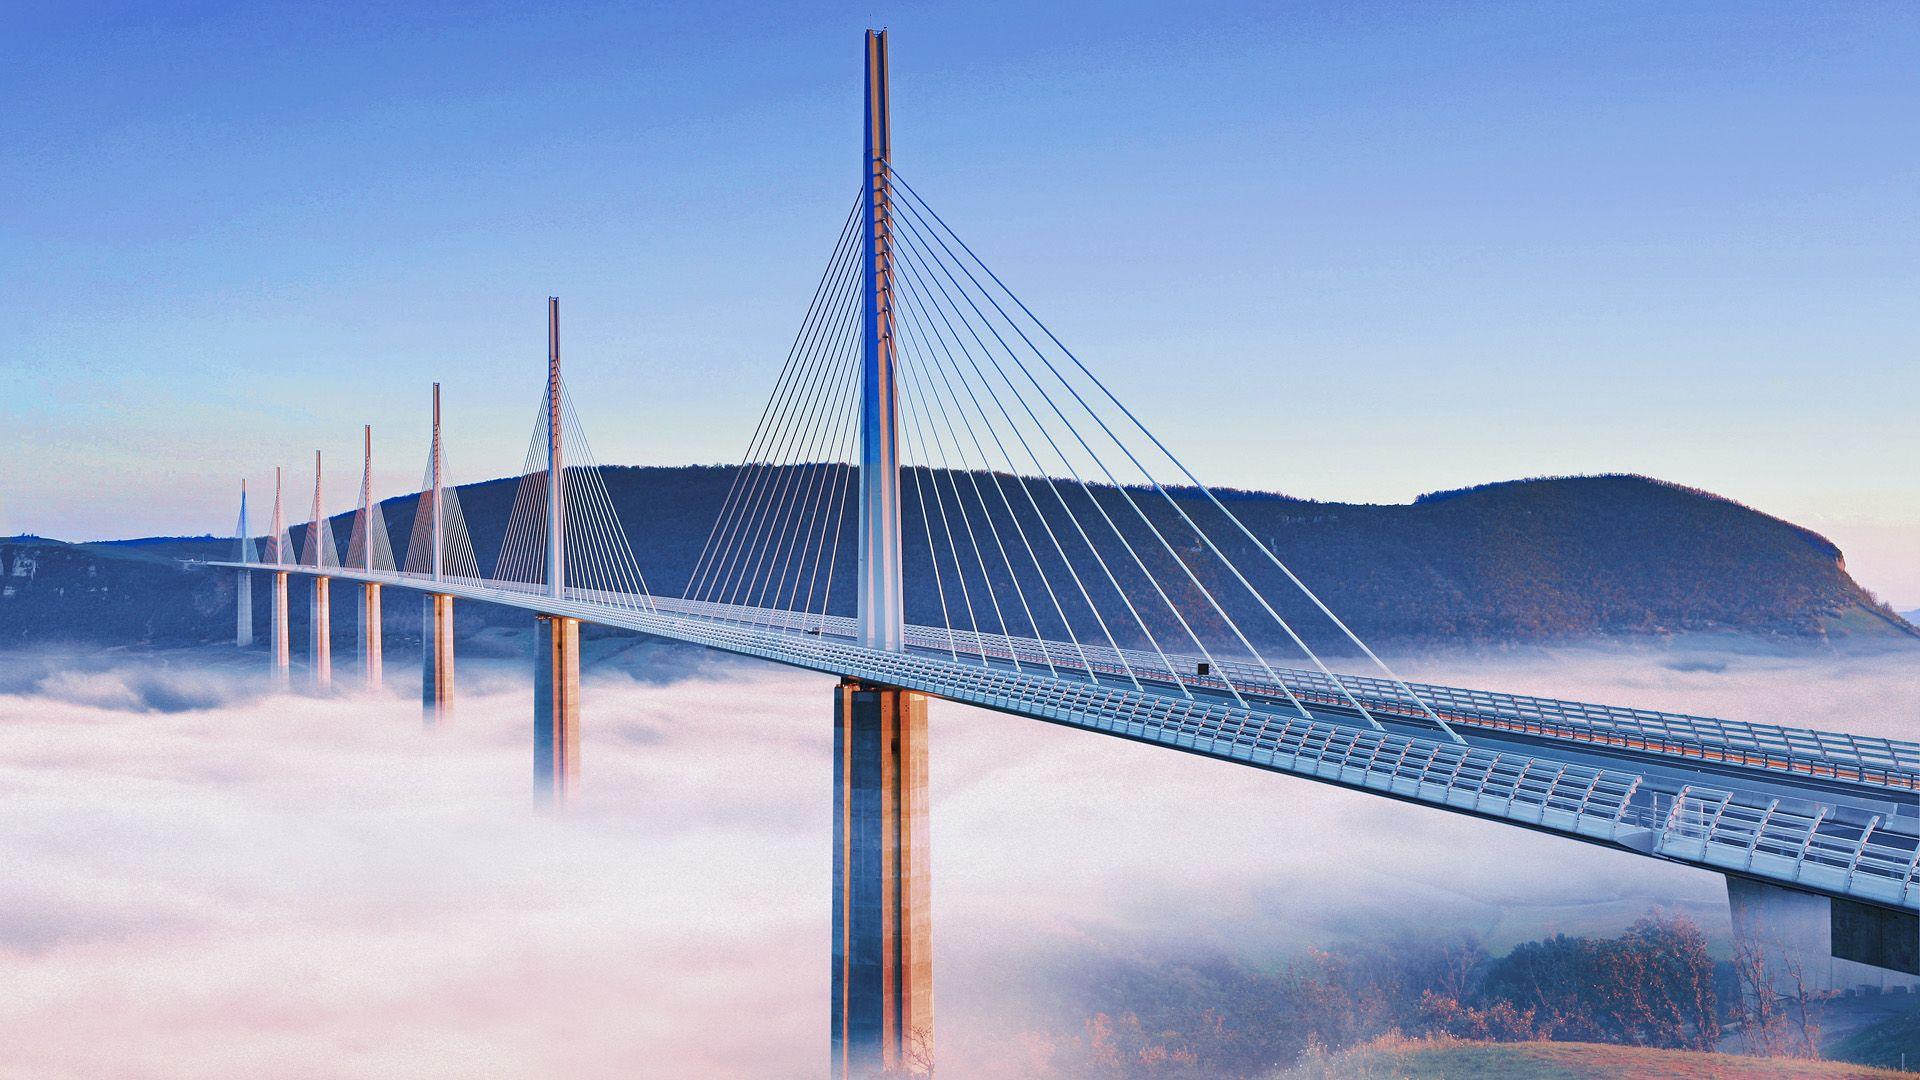 Bridge Hd Wallpapers Page 0